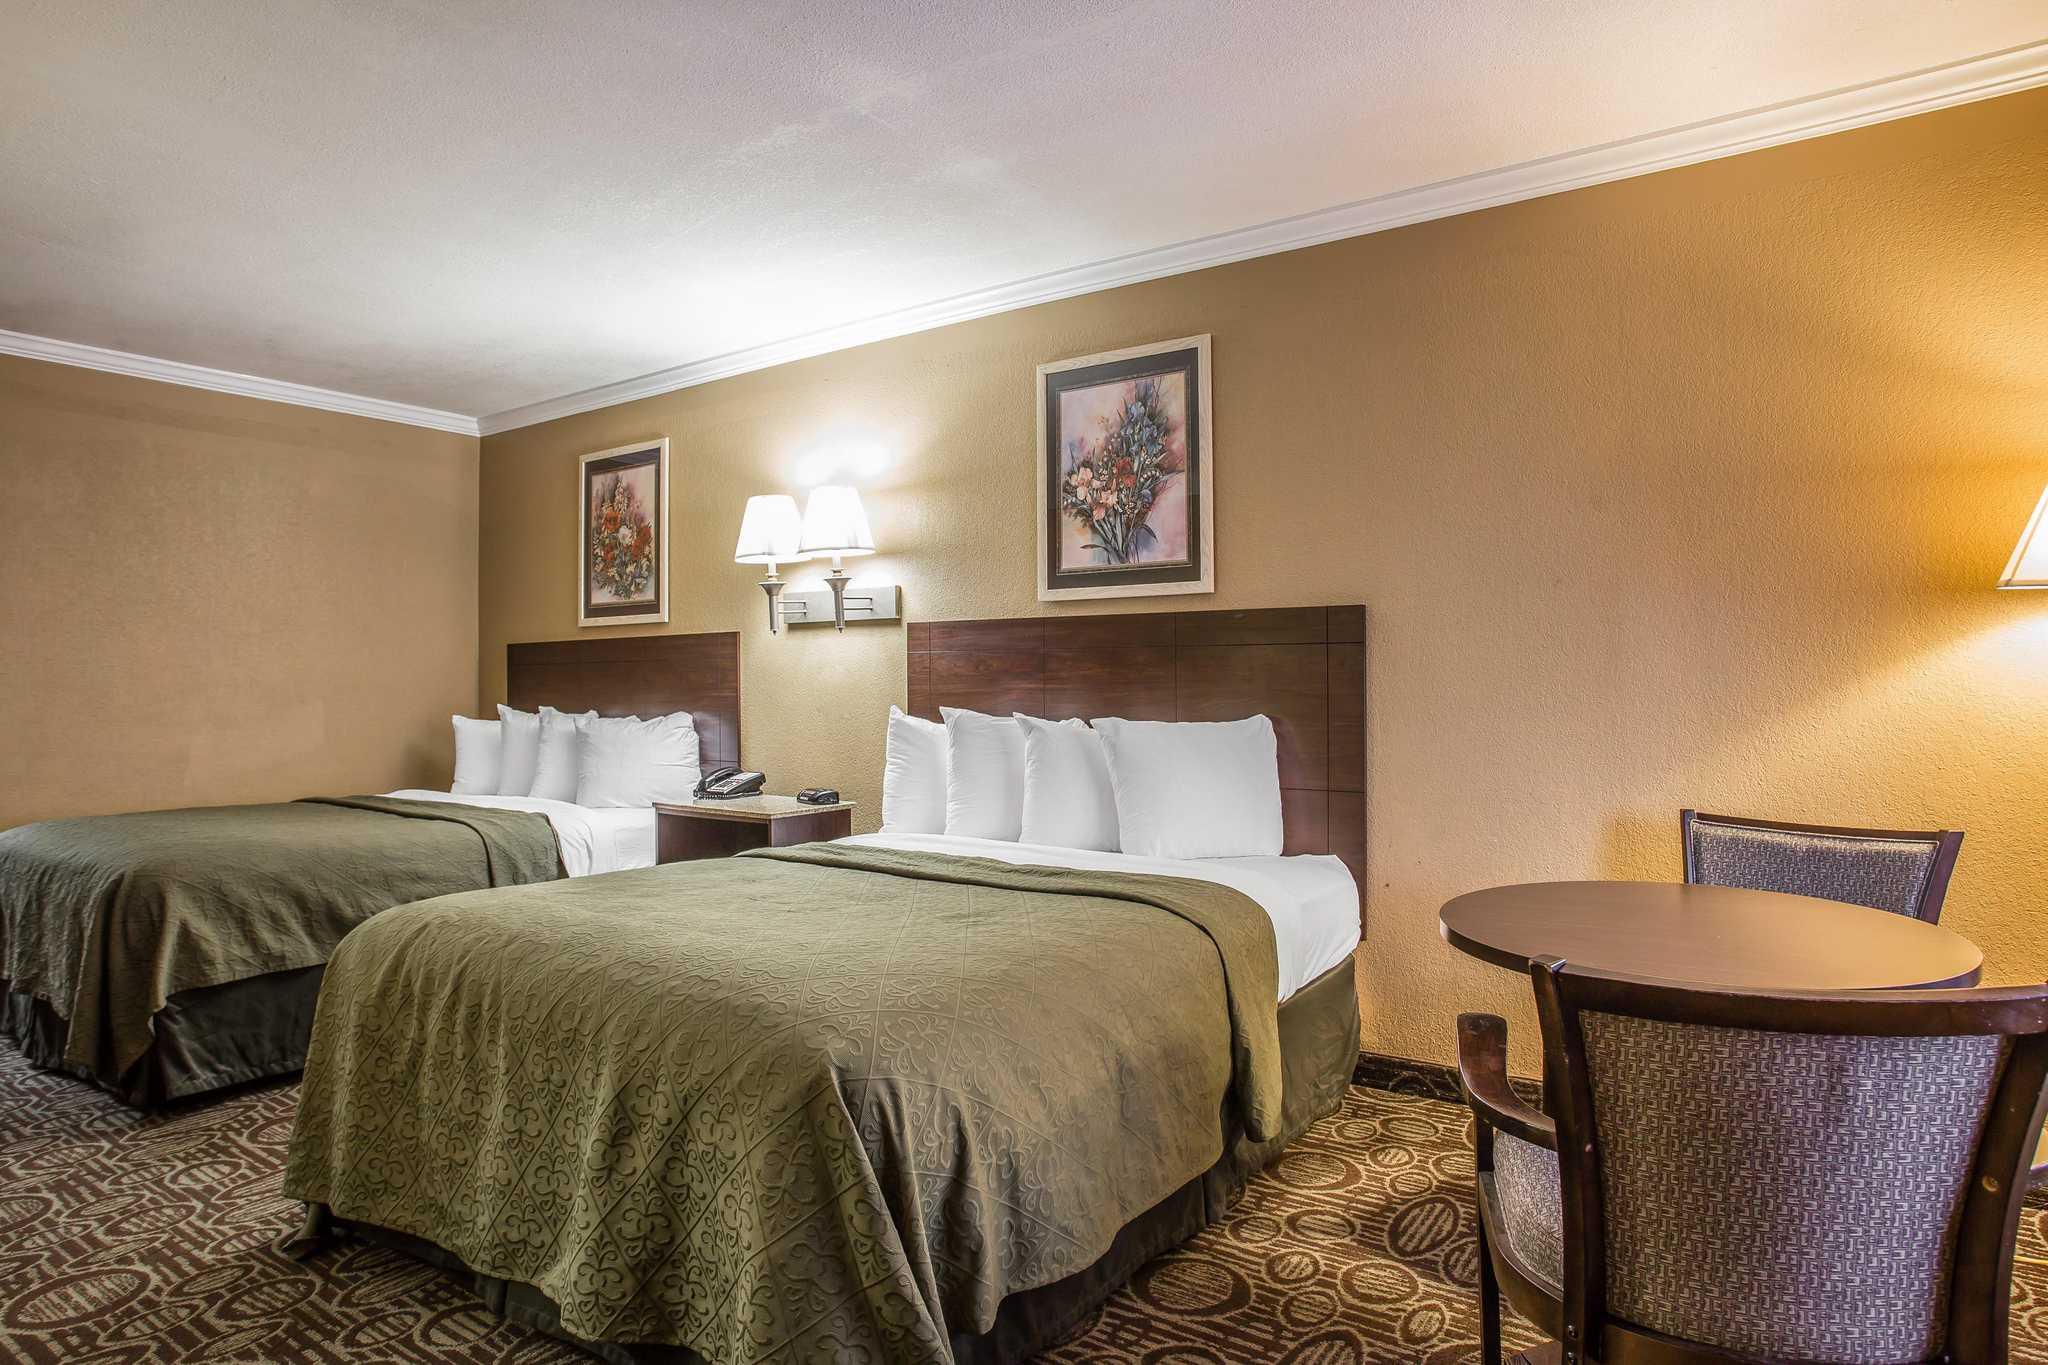 Quality Inn & Suites Ft. Jackson Maingate image 13